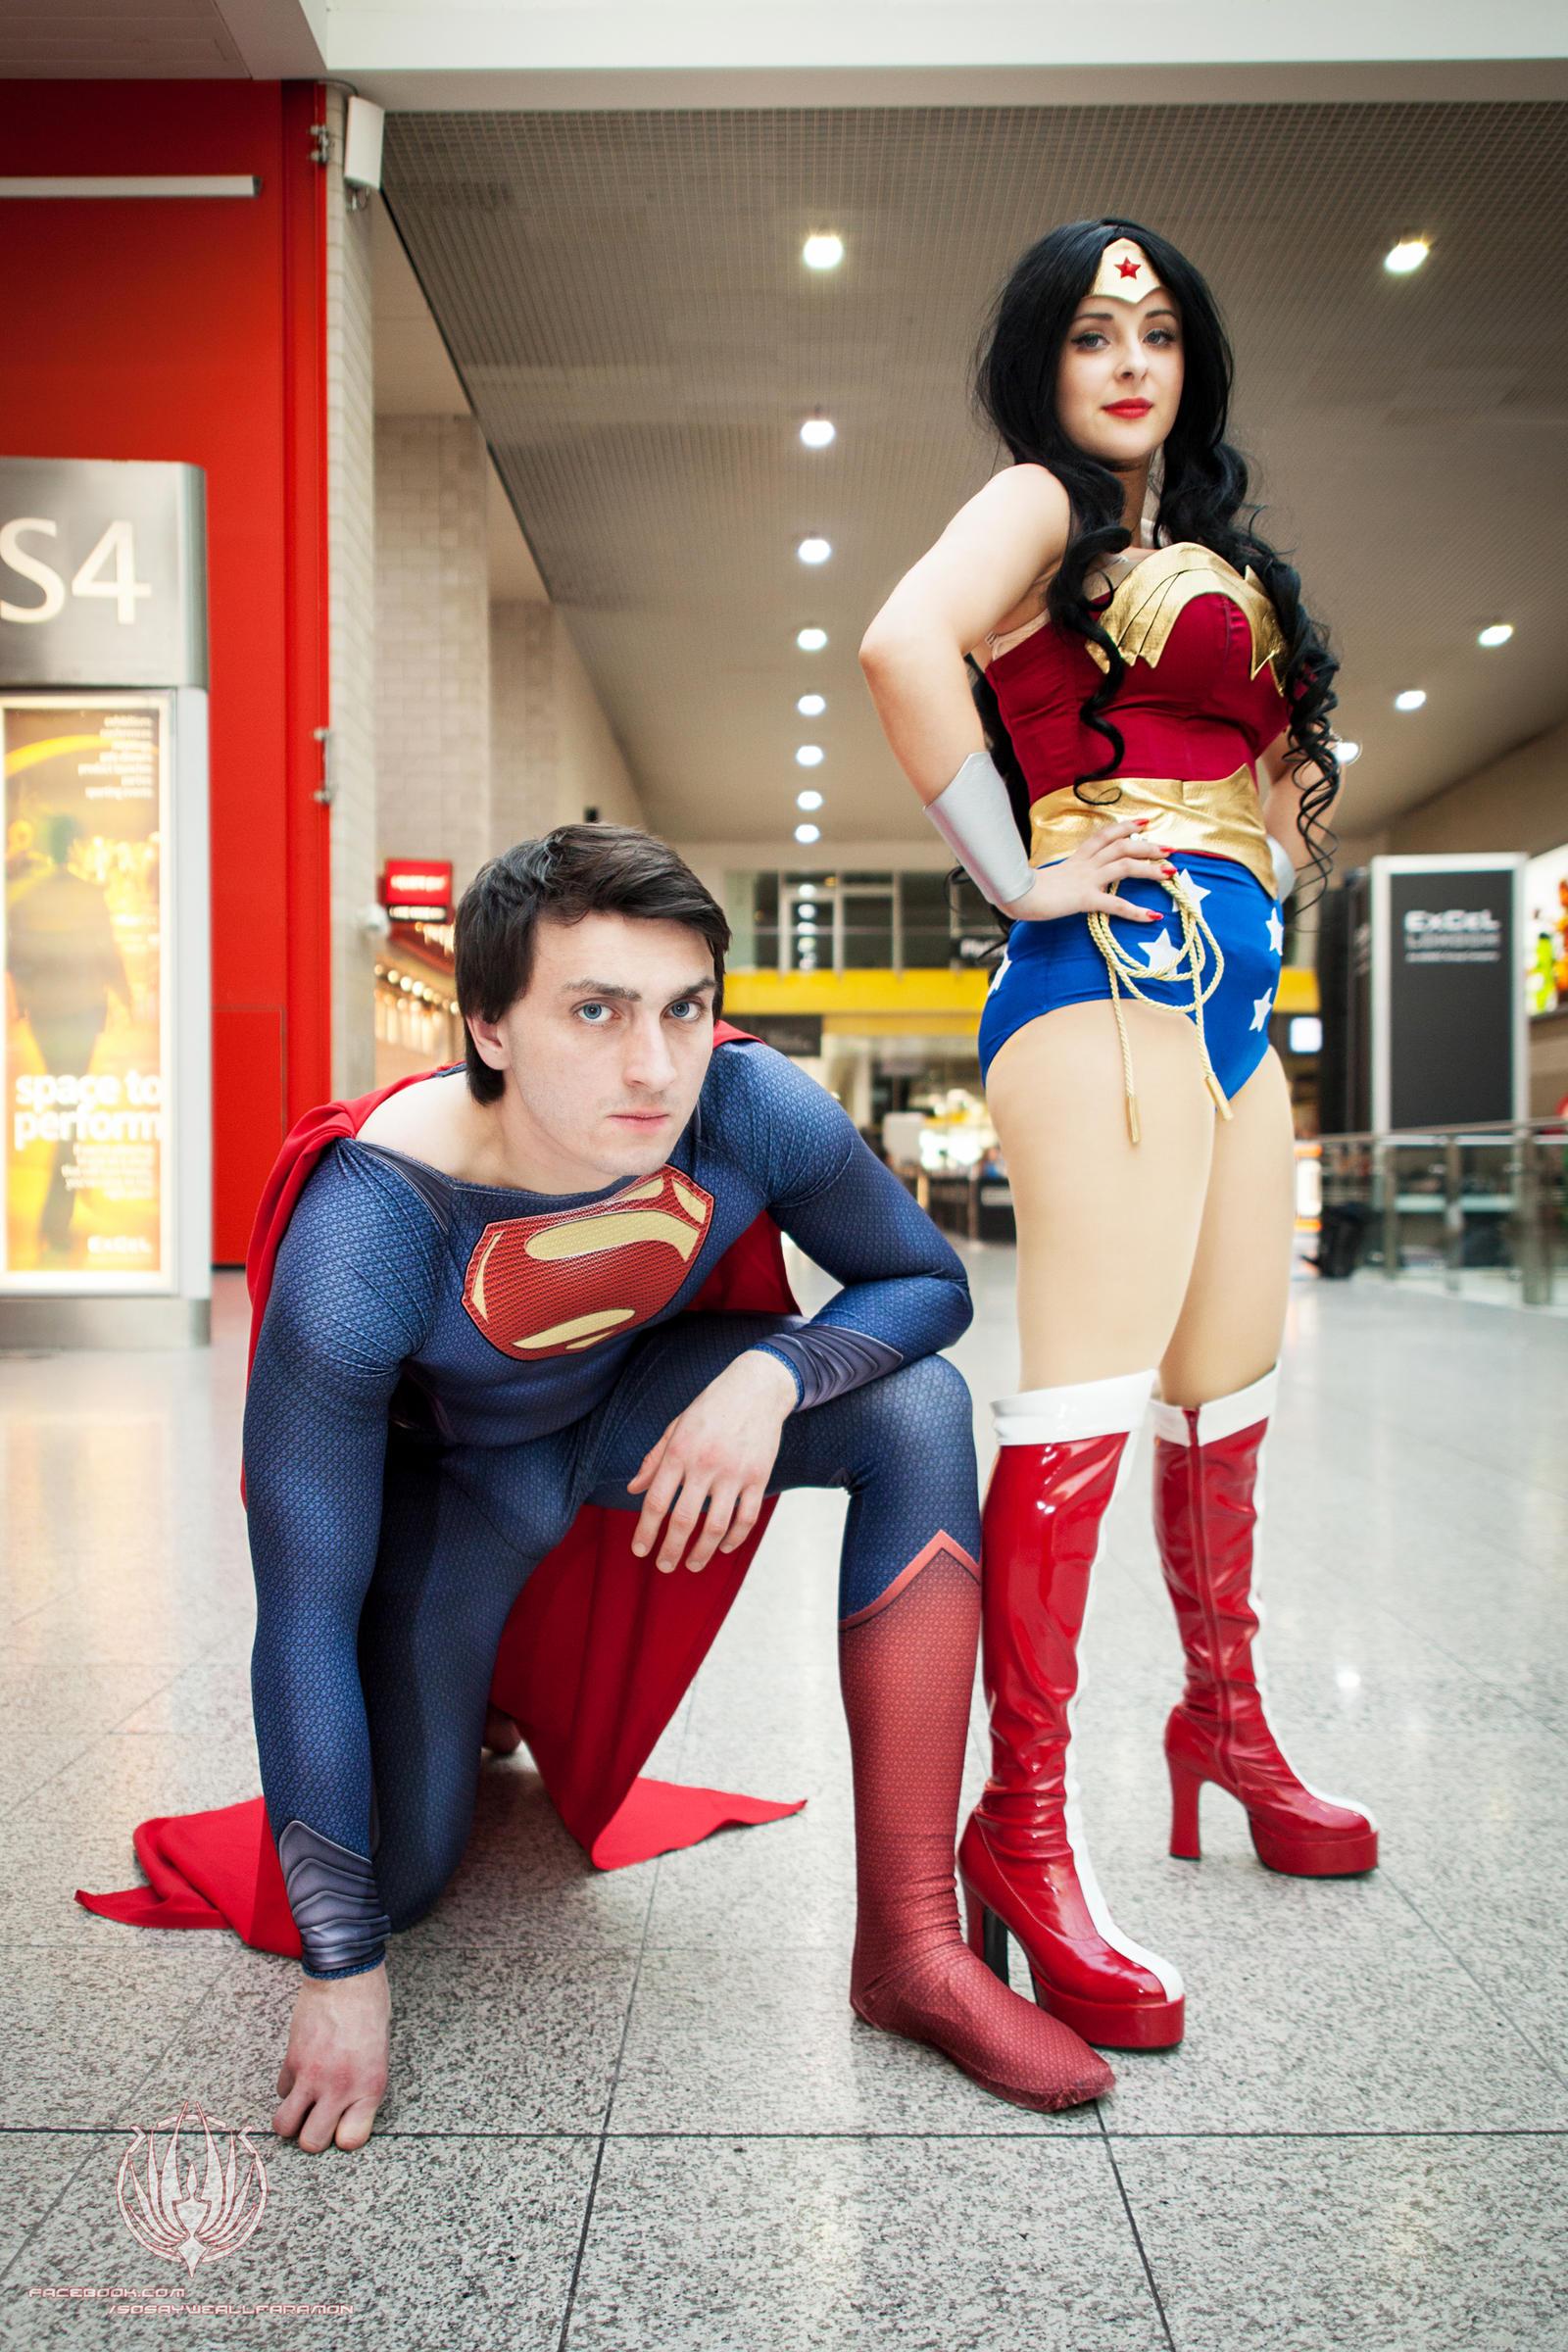 Superman and Wonder Woman Hitting up LSCC by faramon